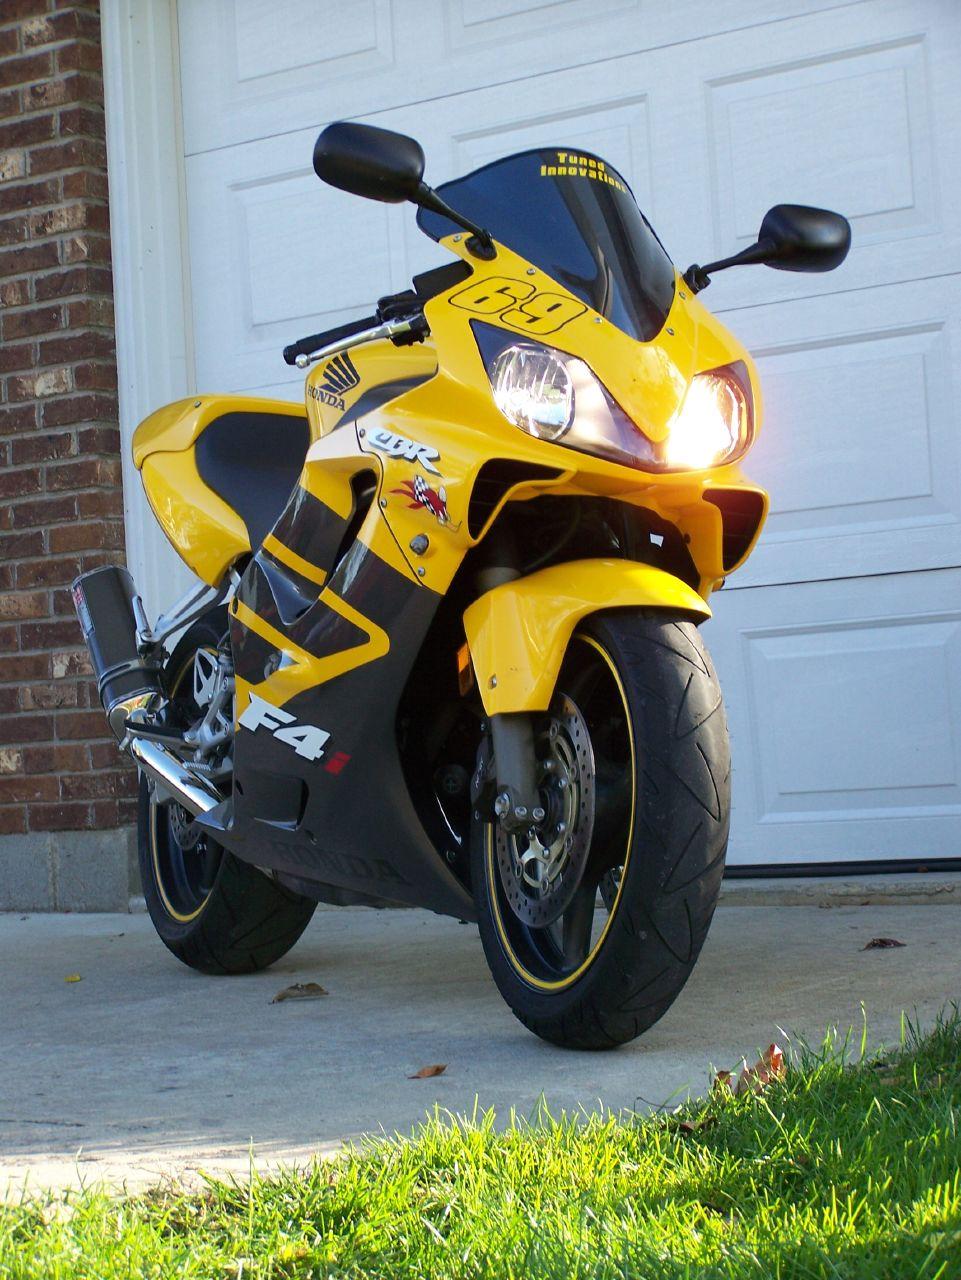 Pics of my bike 1492216740_3c26532bea_o